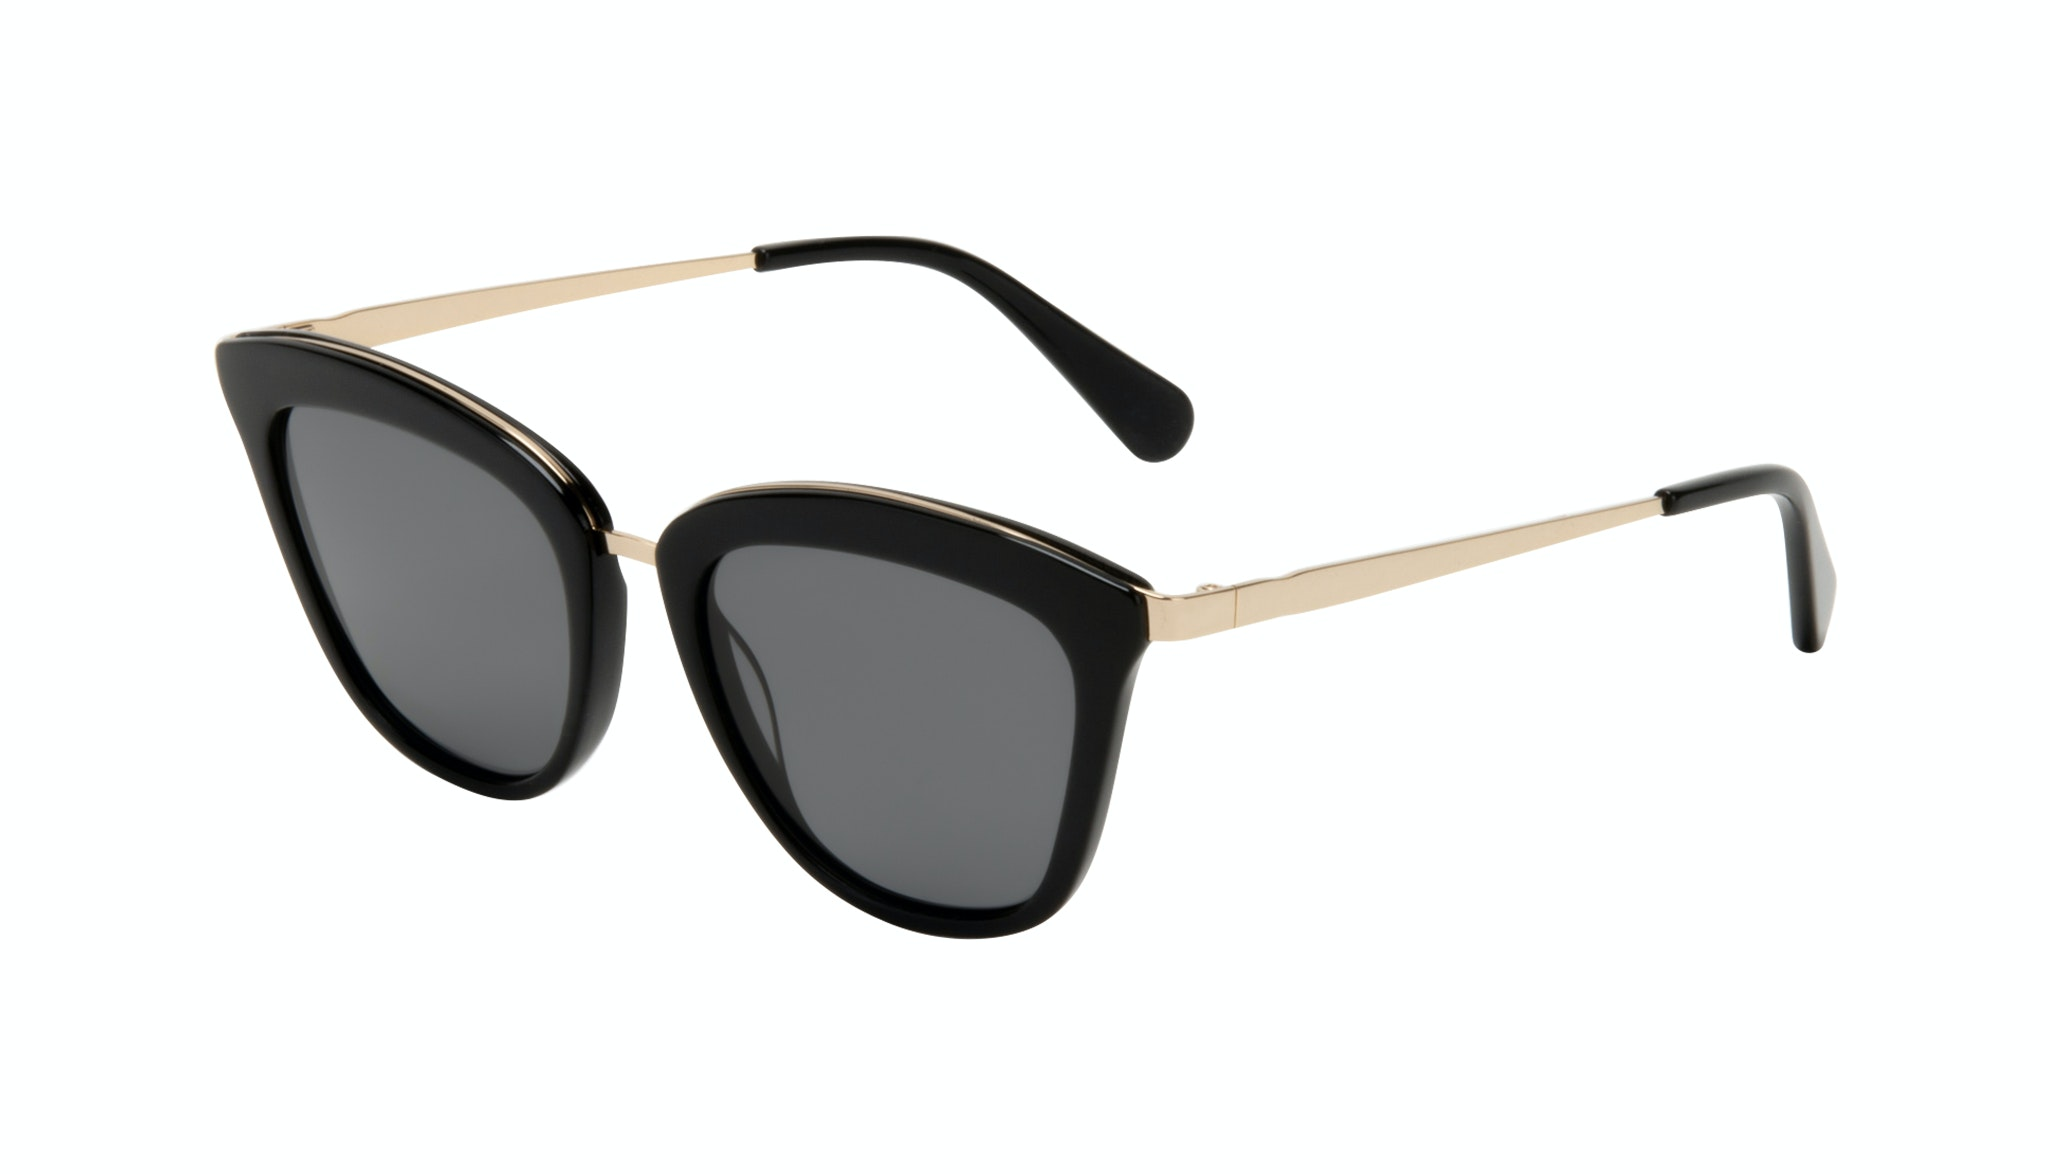 Affordable Fashion Glasses Cat Eye Sunglasses Women More Petite Onyx Tilt